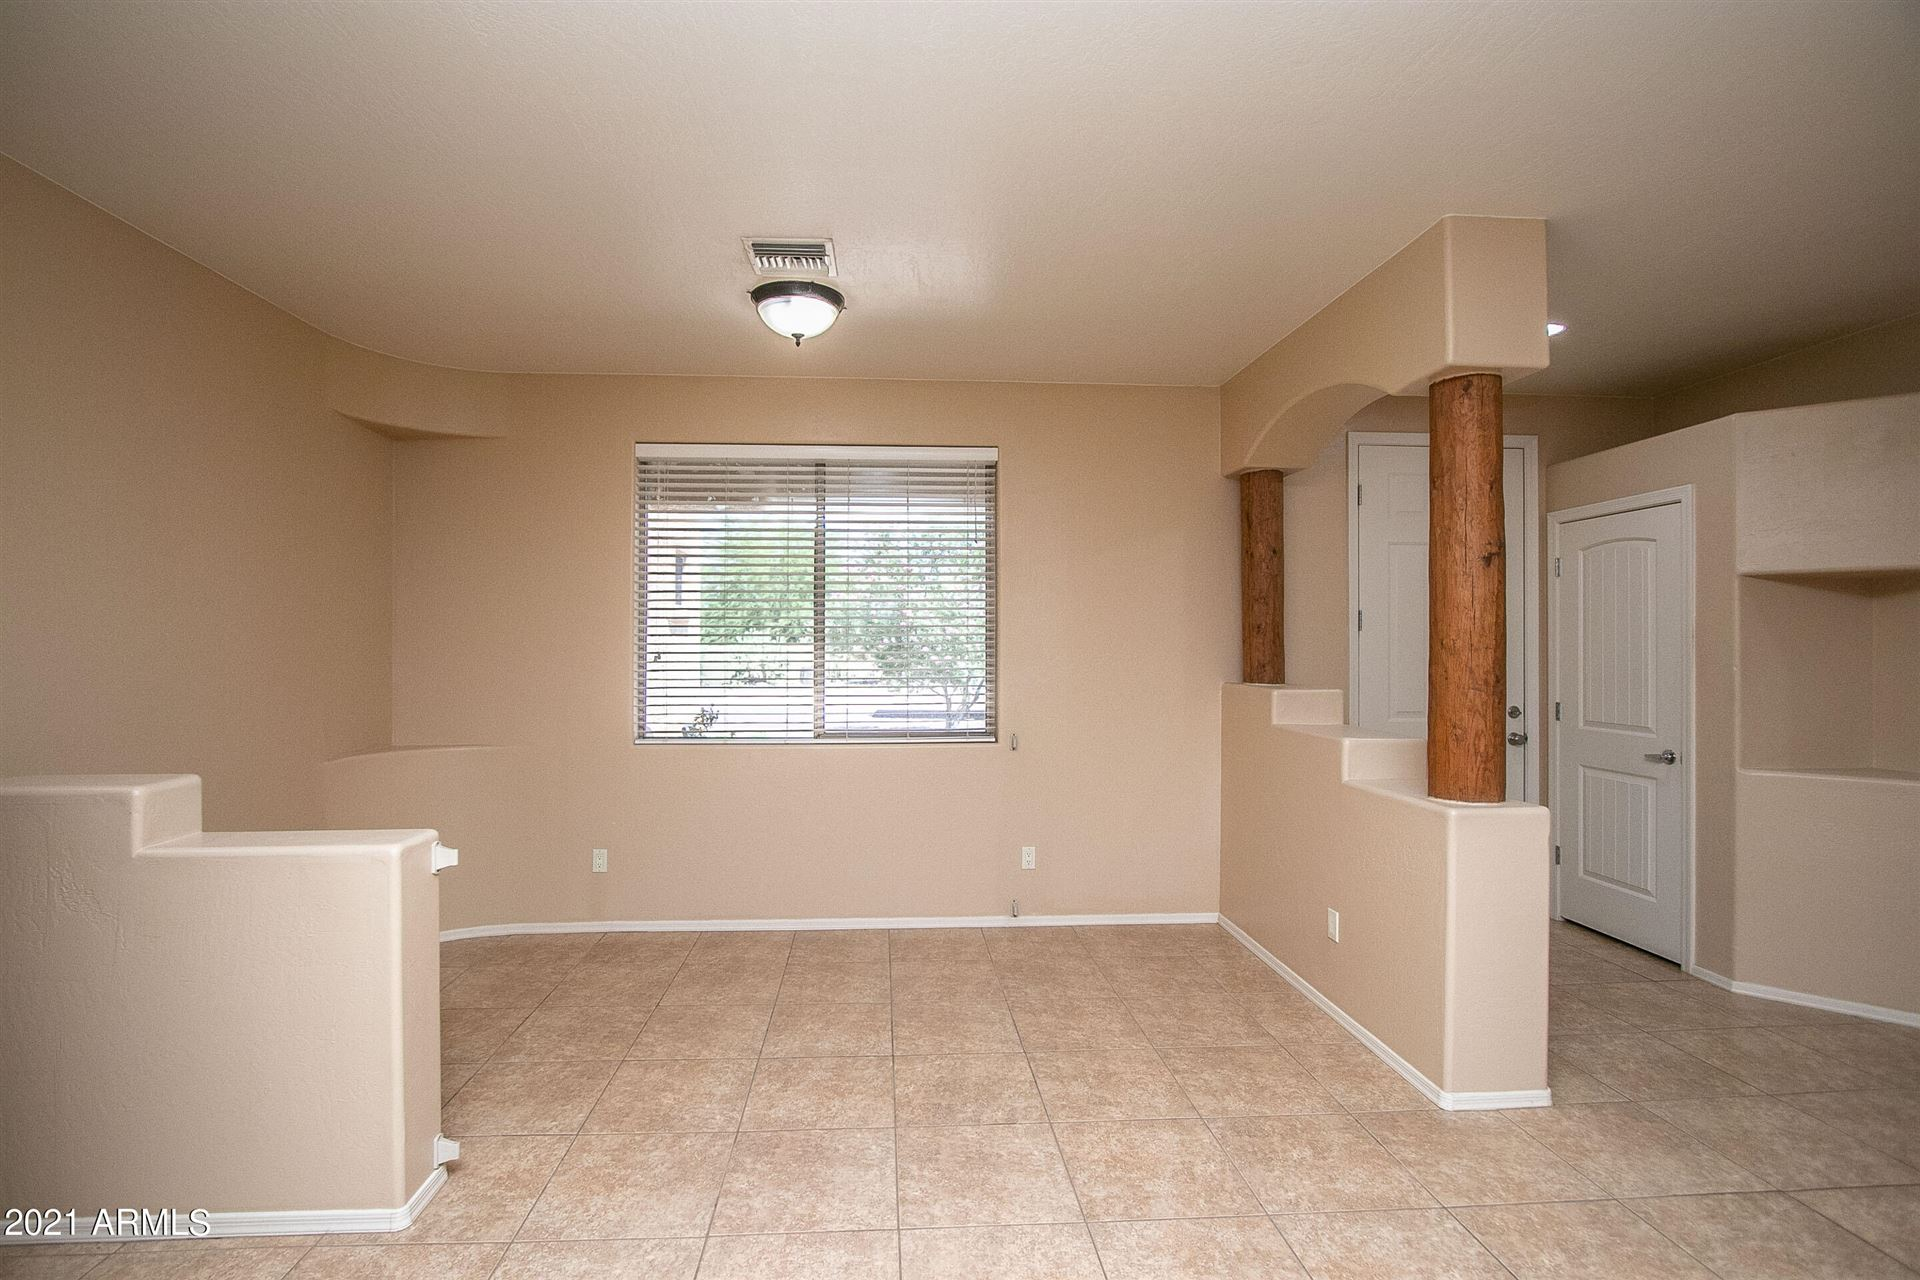 Photo of 21039 W MADRE DEL ORO Drive, Wittmann, AZ 85361 (MLS # 6290724)